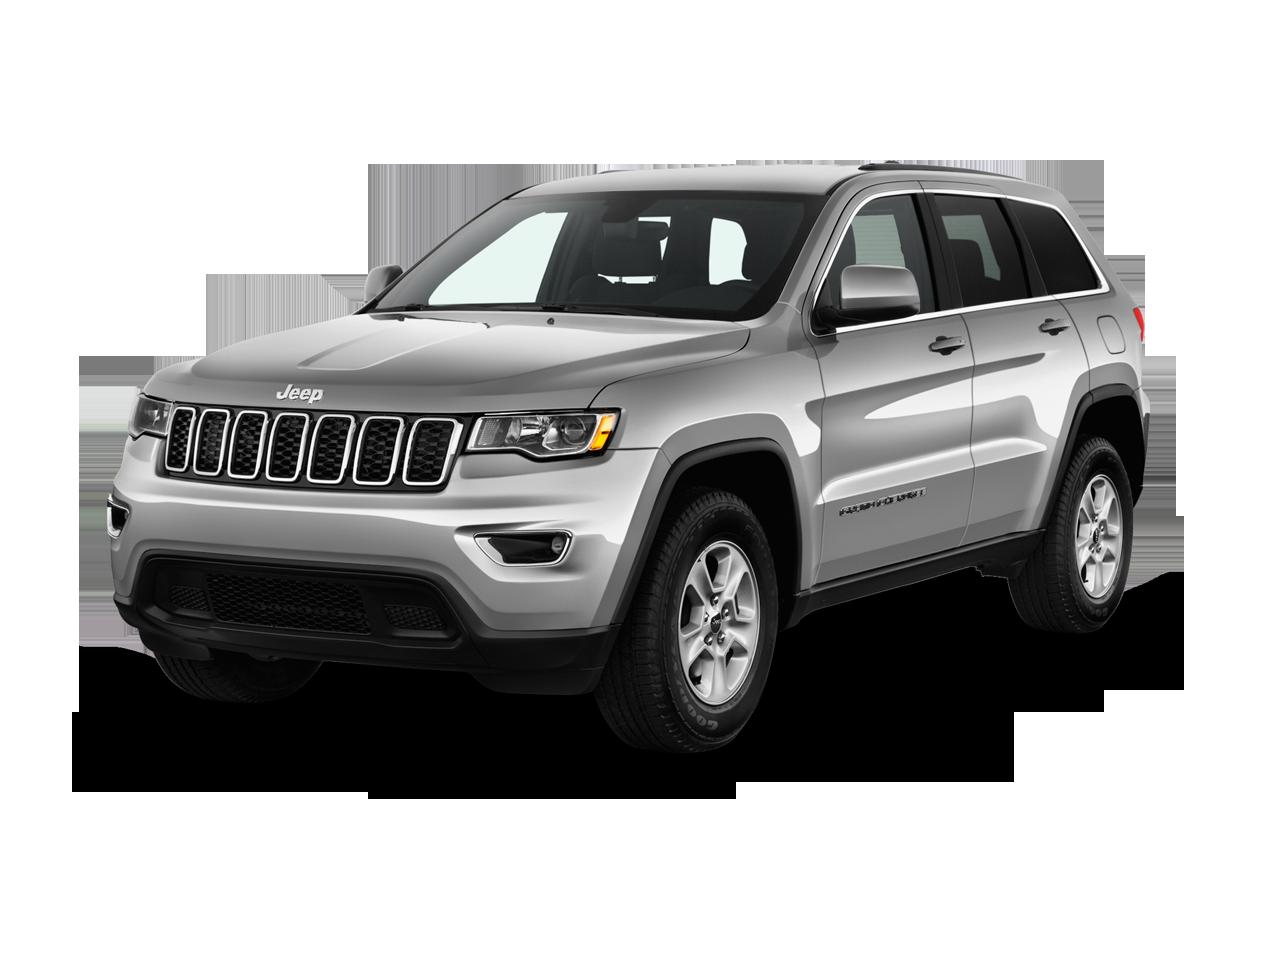 new 2017 jeep grand cherokee laredo near oklahoma city ok david stanley dodge. Black Bedroom Furniture Sets. Home Design Ideas